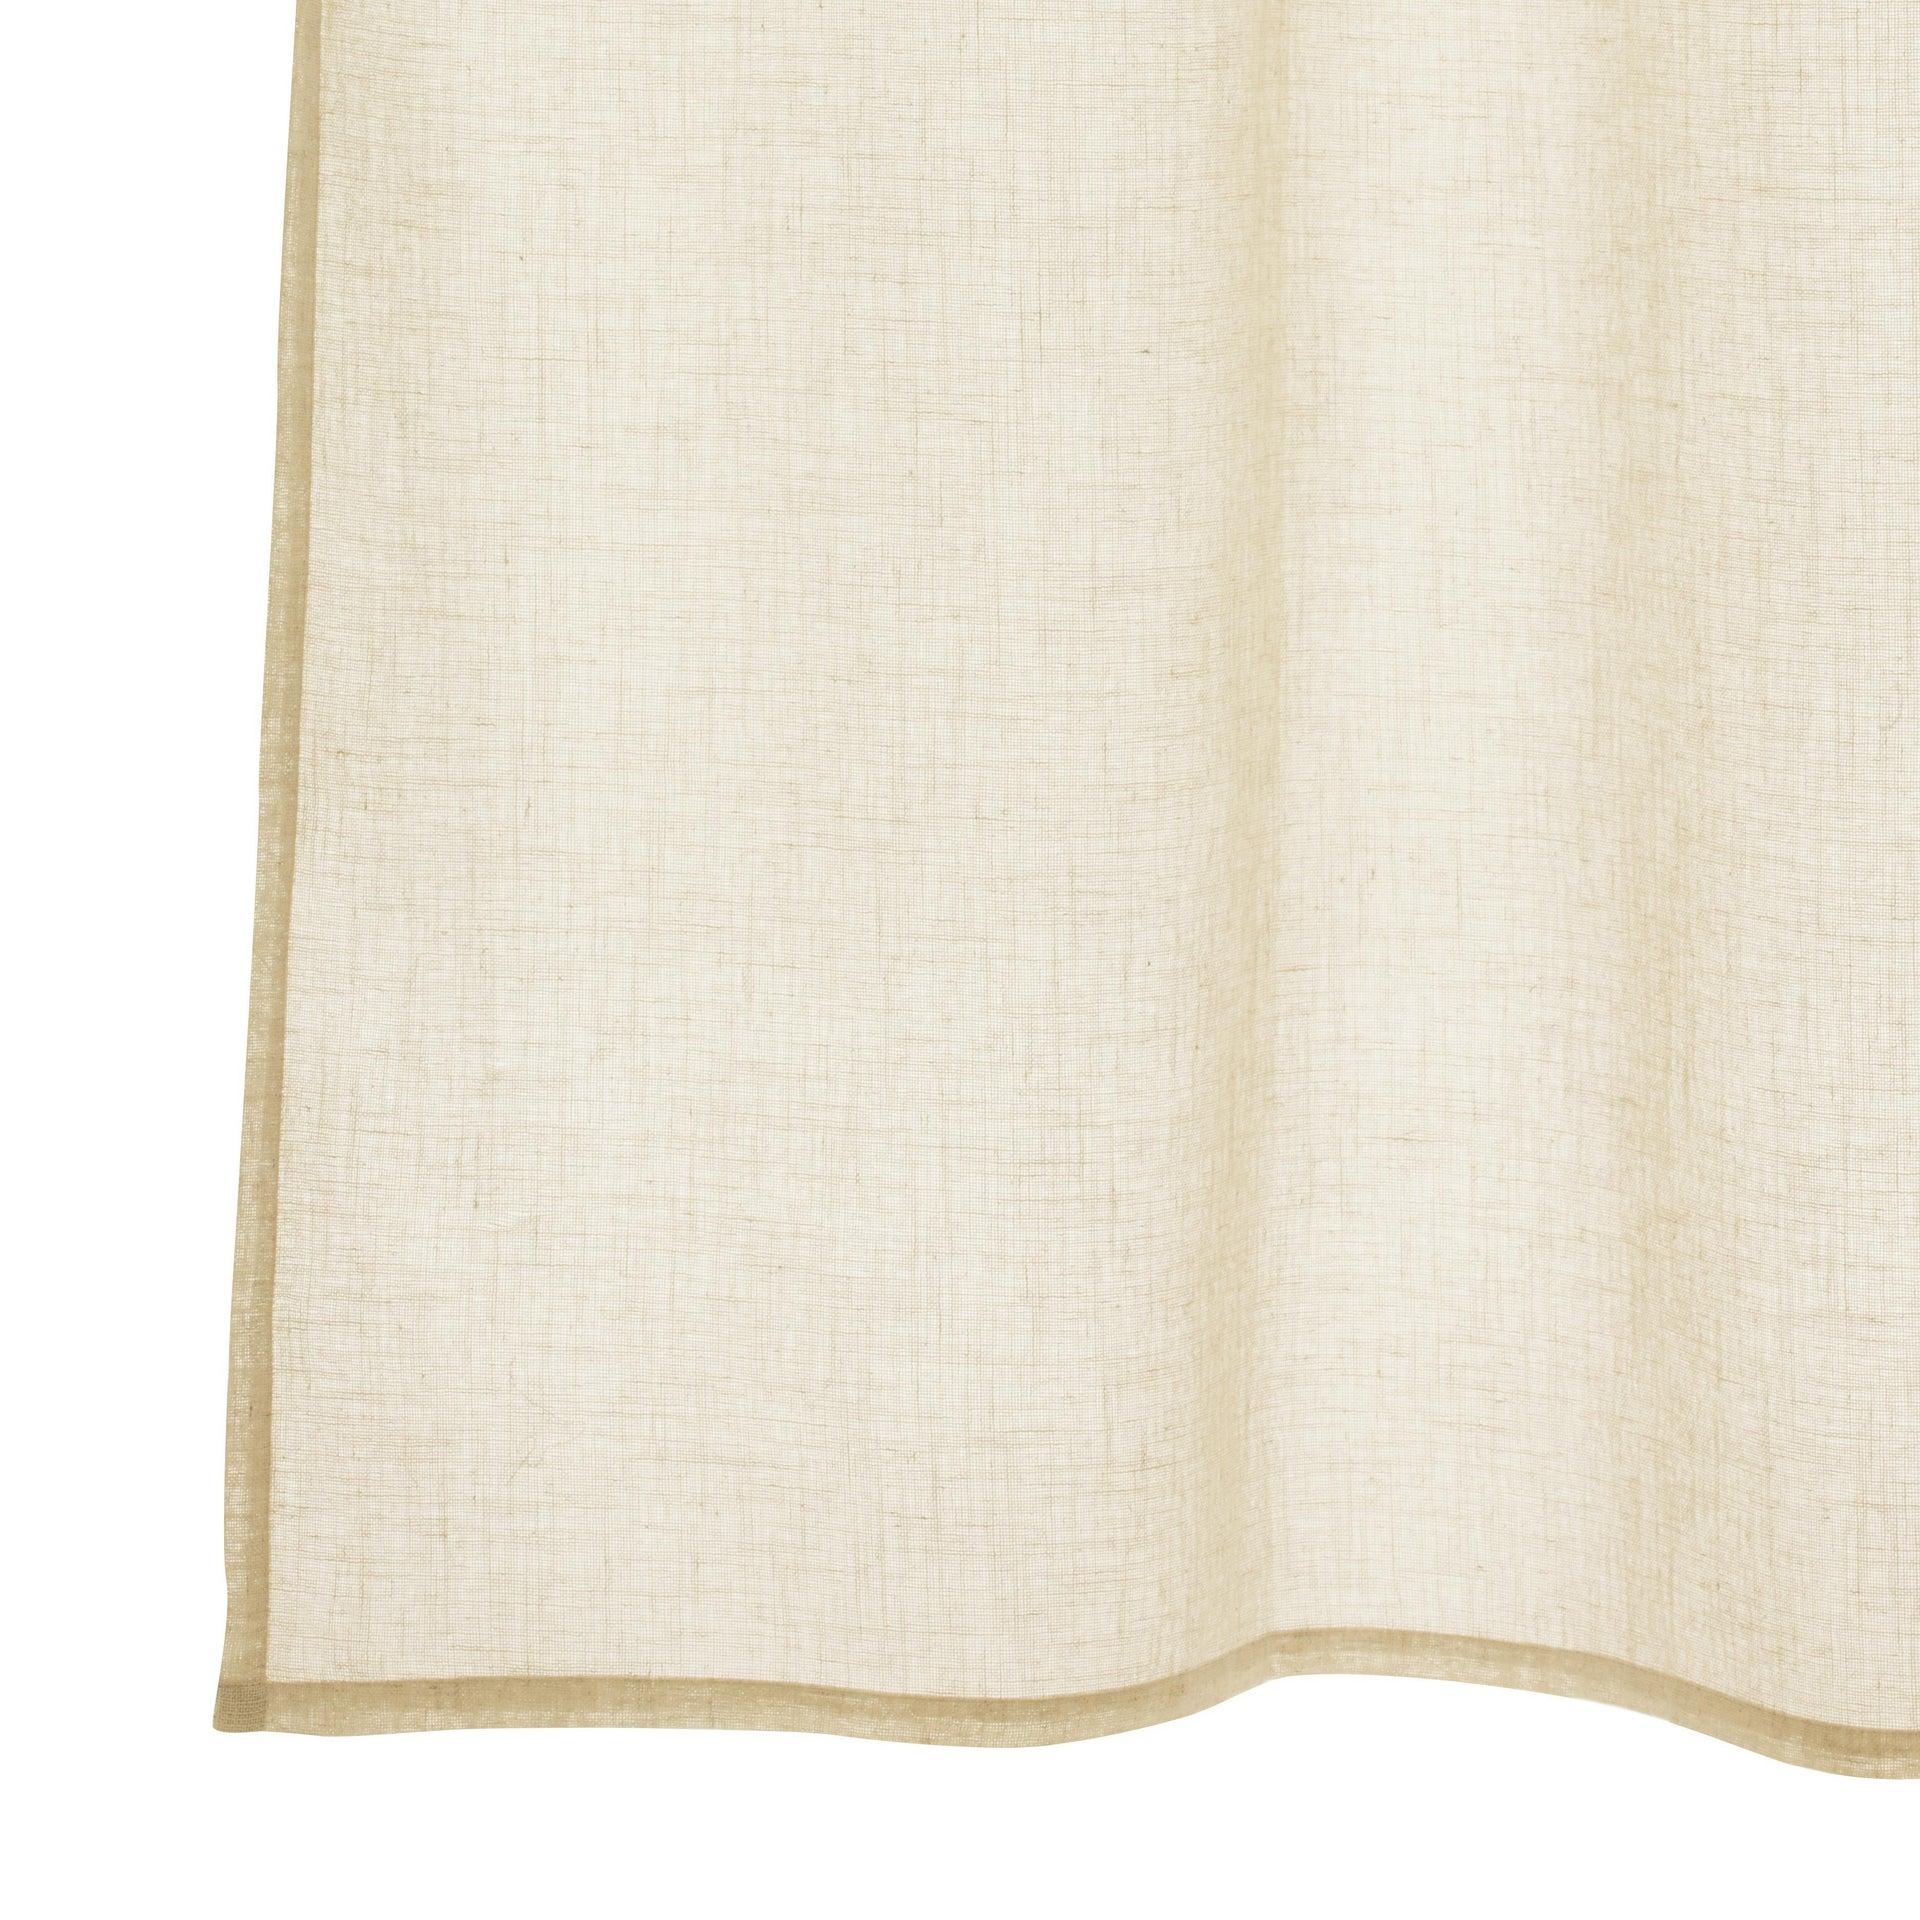 Tenda INSPIRE Charlina beige occhielli 140 x 280 cm - 6